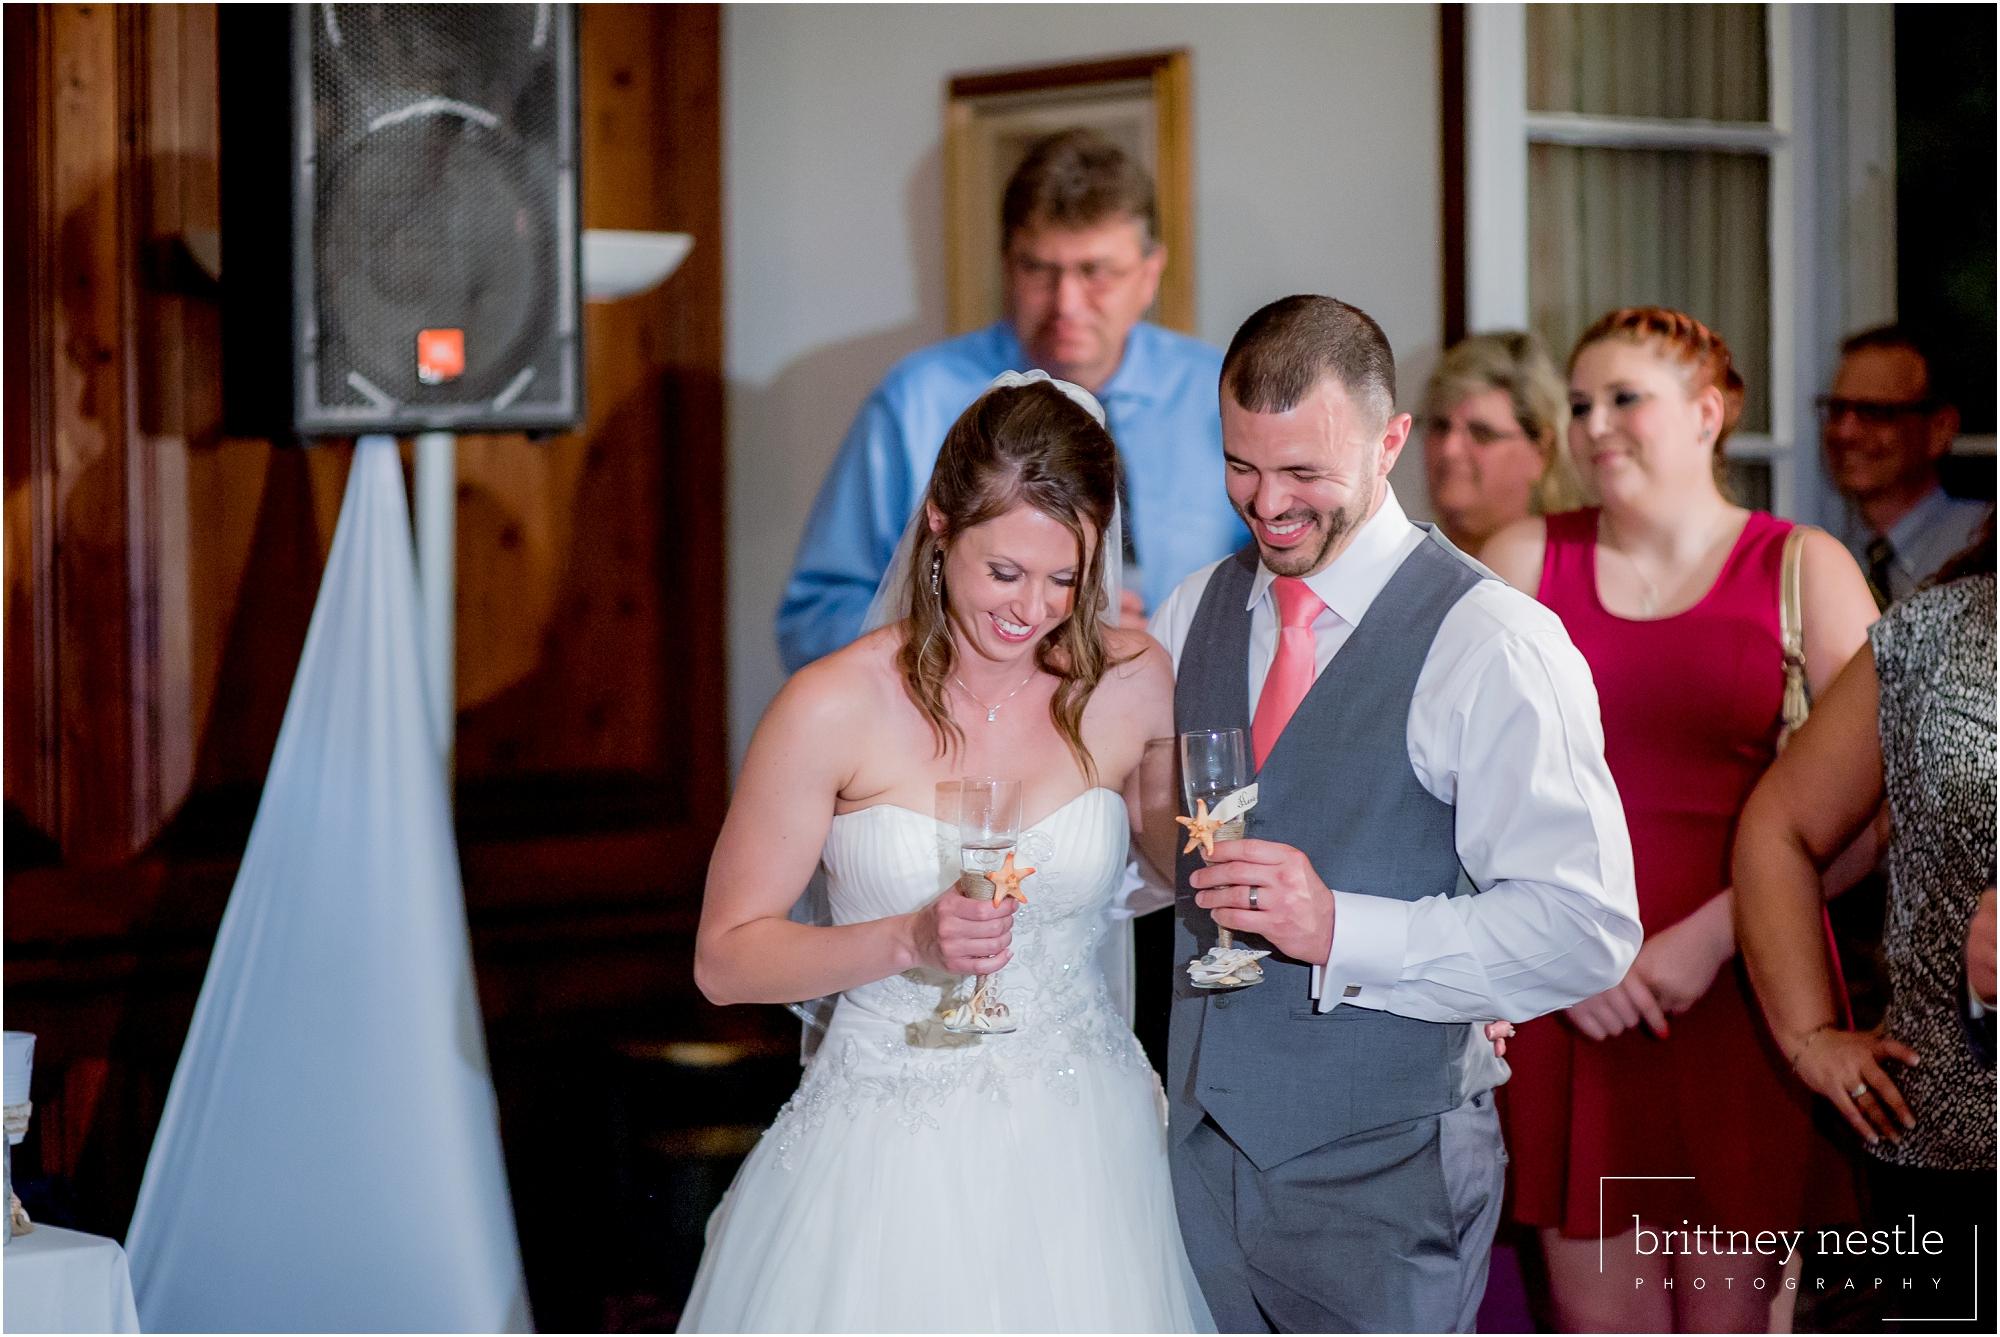 BNP_summer-cliffside-wedding-madden.jpg